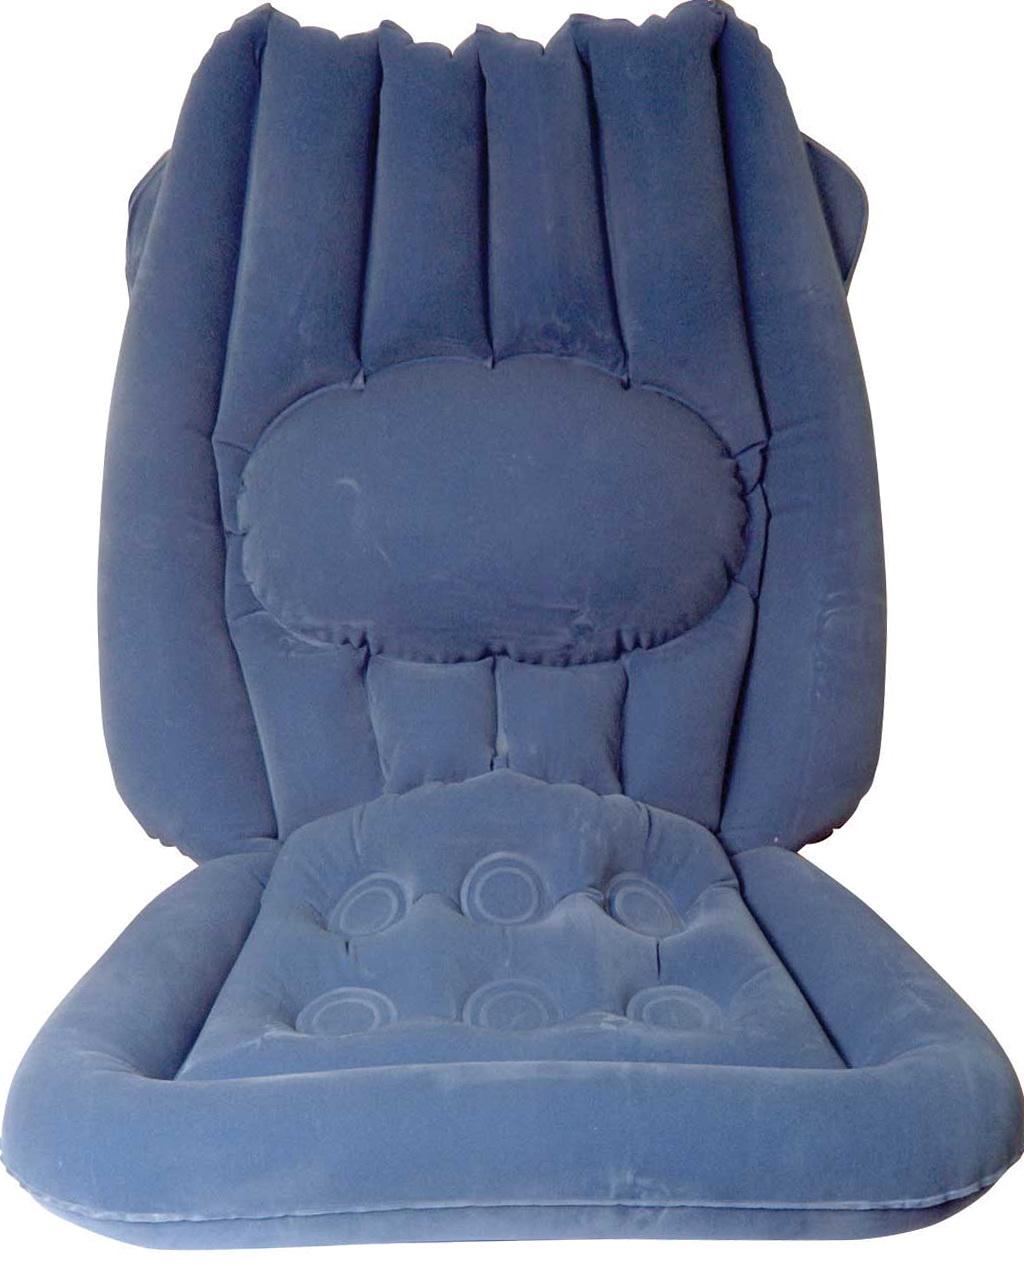 Truck Seat Cushions Manufacturers